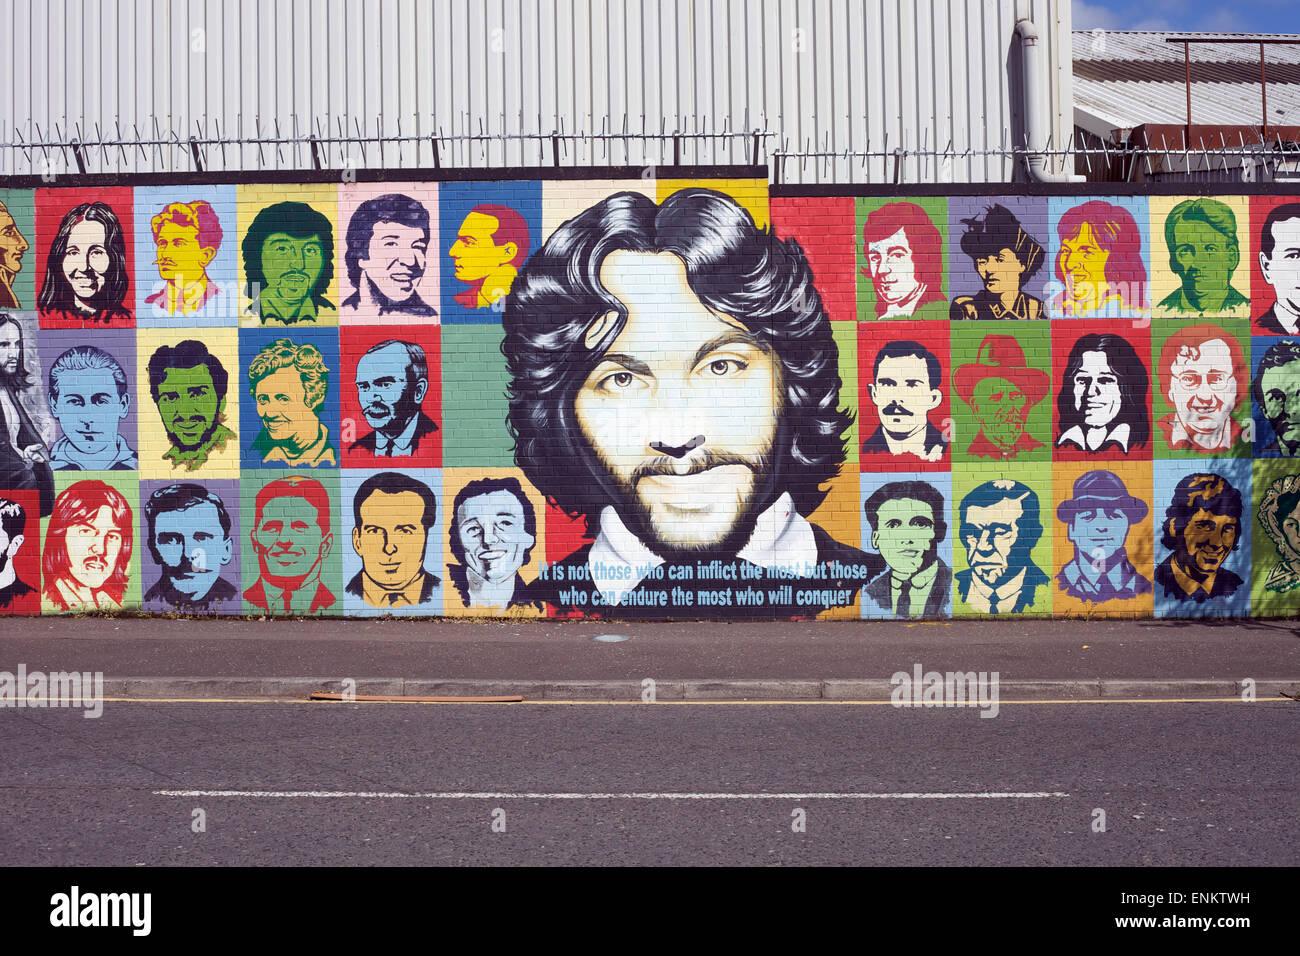 Solidarity Mural, Falls Road, Belfast, Northern Ireland - Stock Image